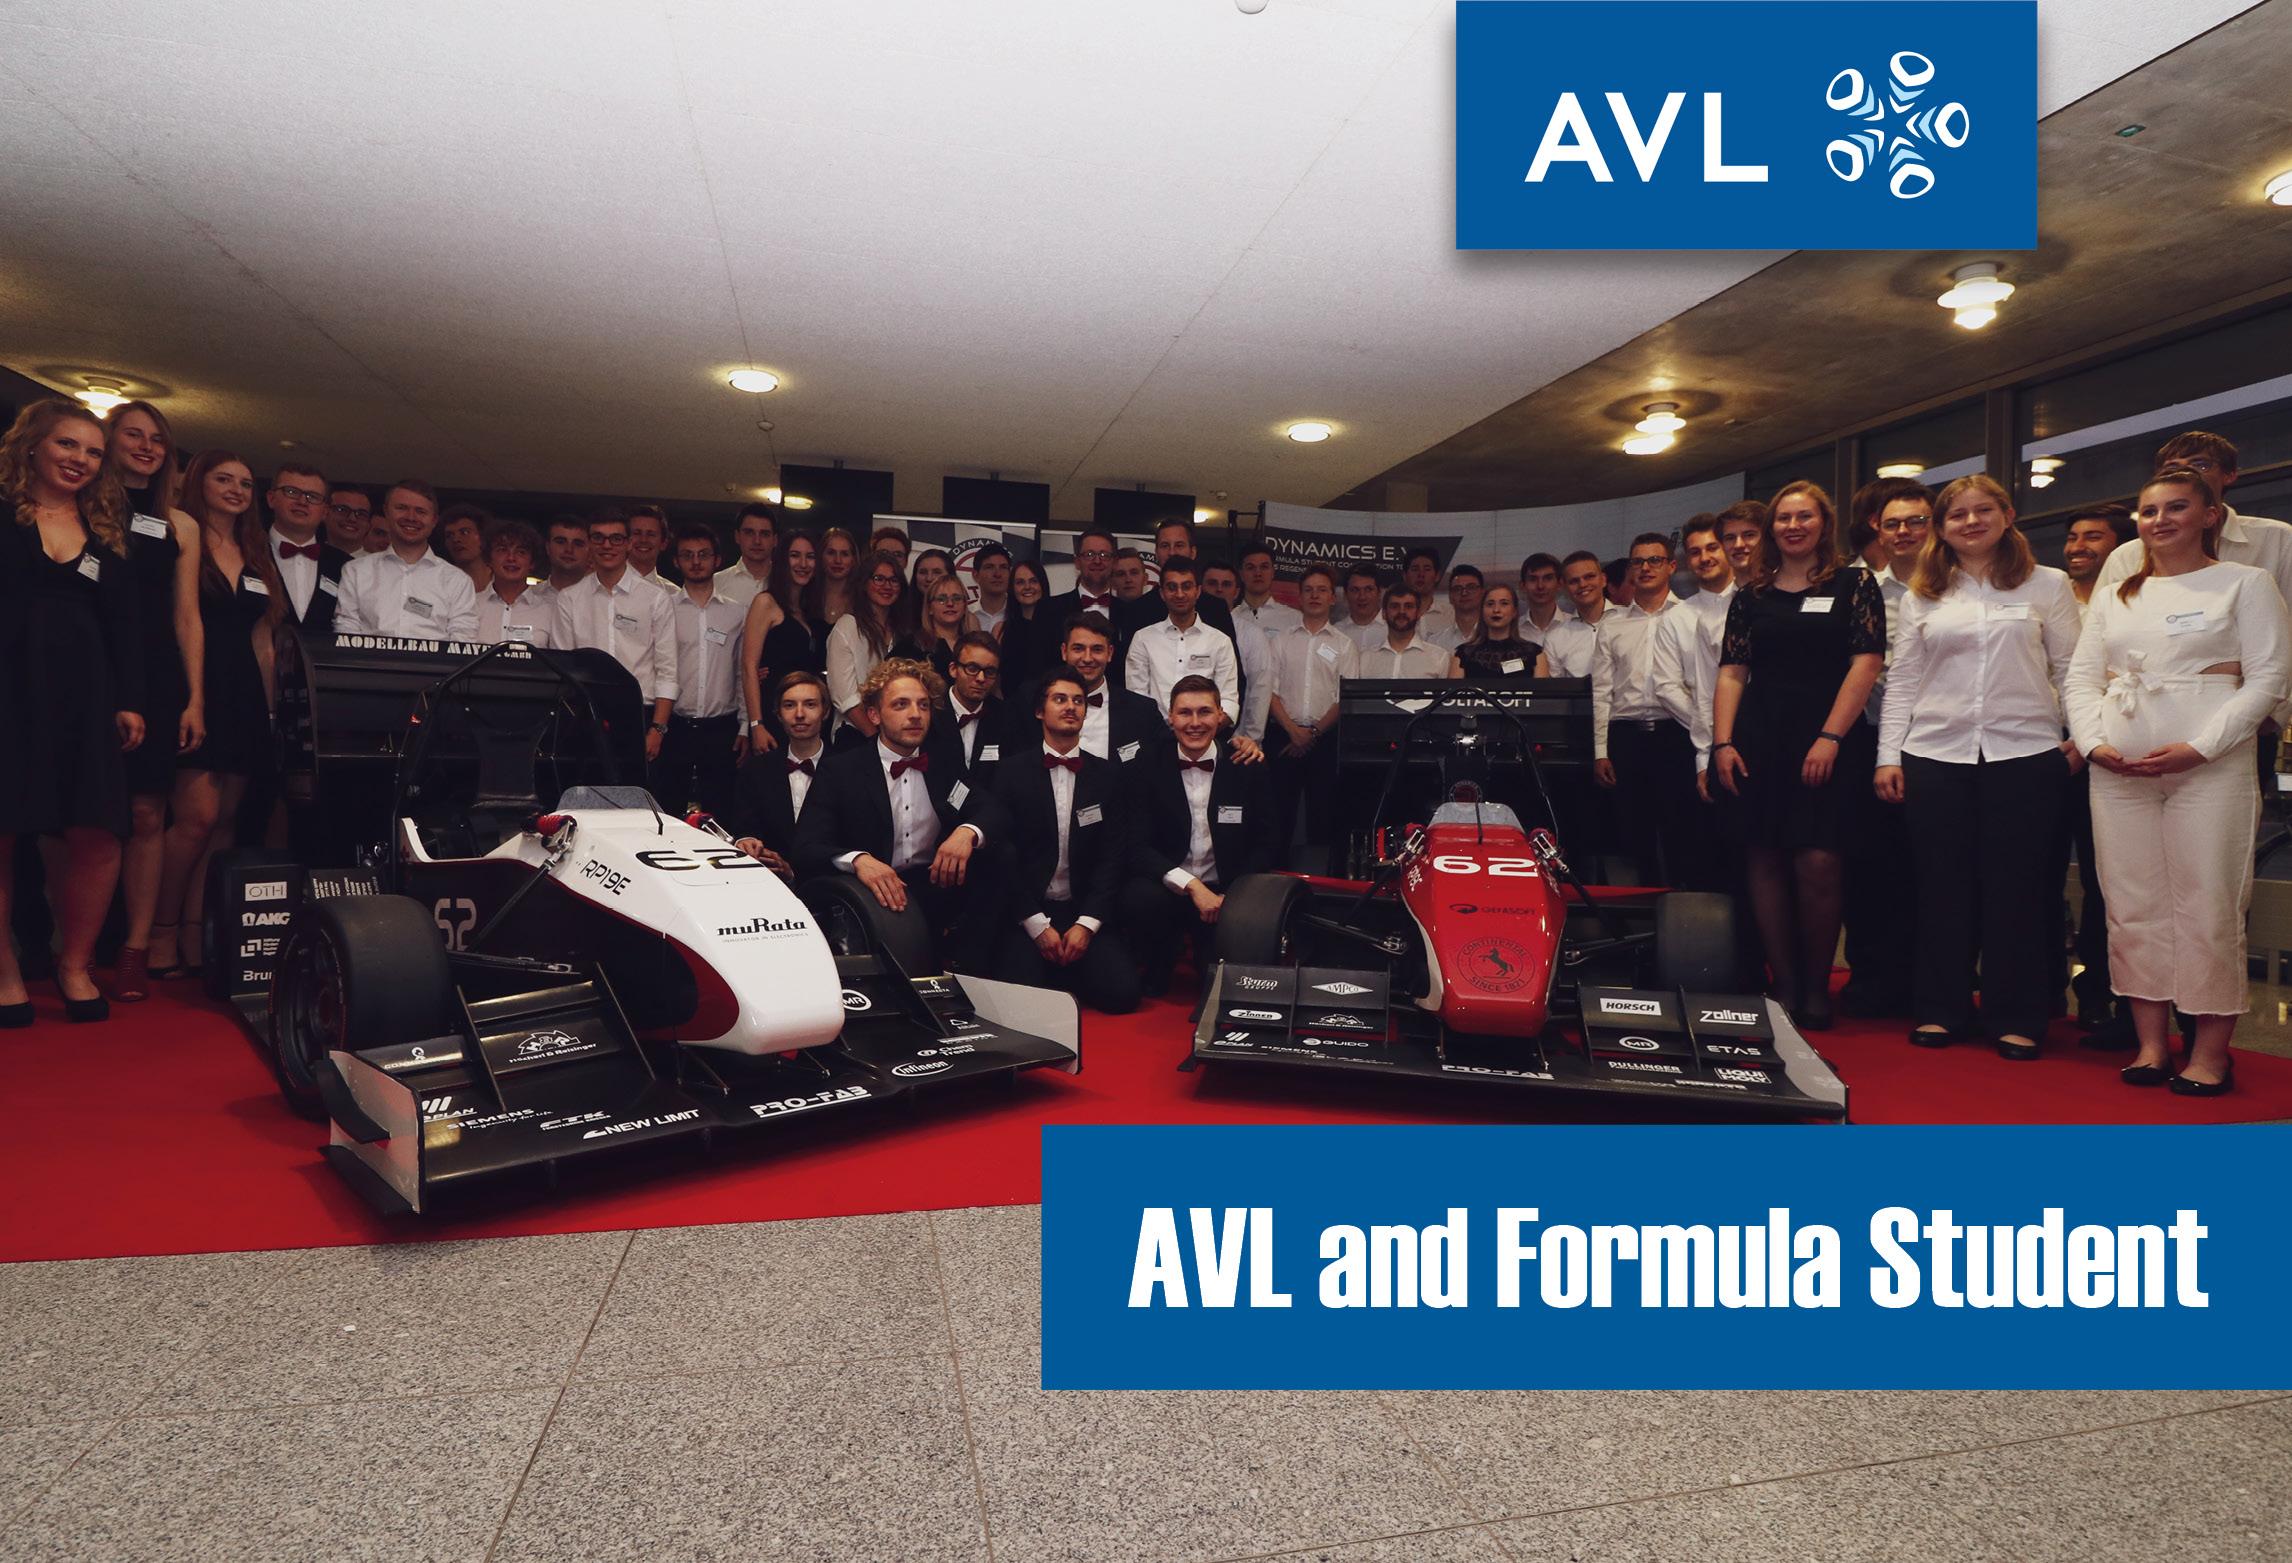 AVL supports Formula Student Regensburg - AVL Software & Functions